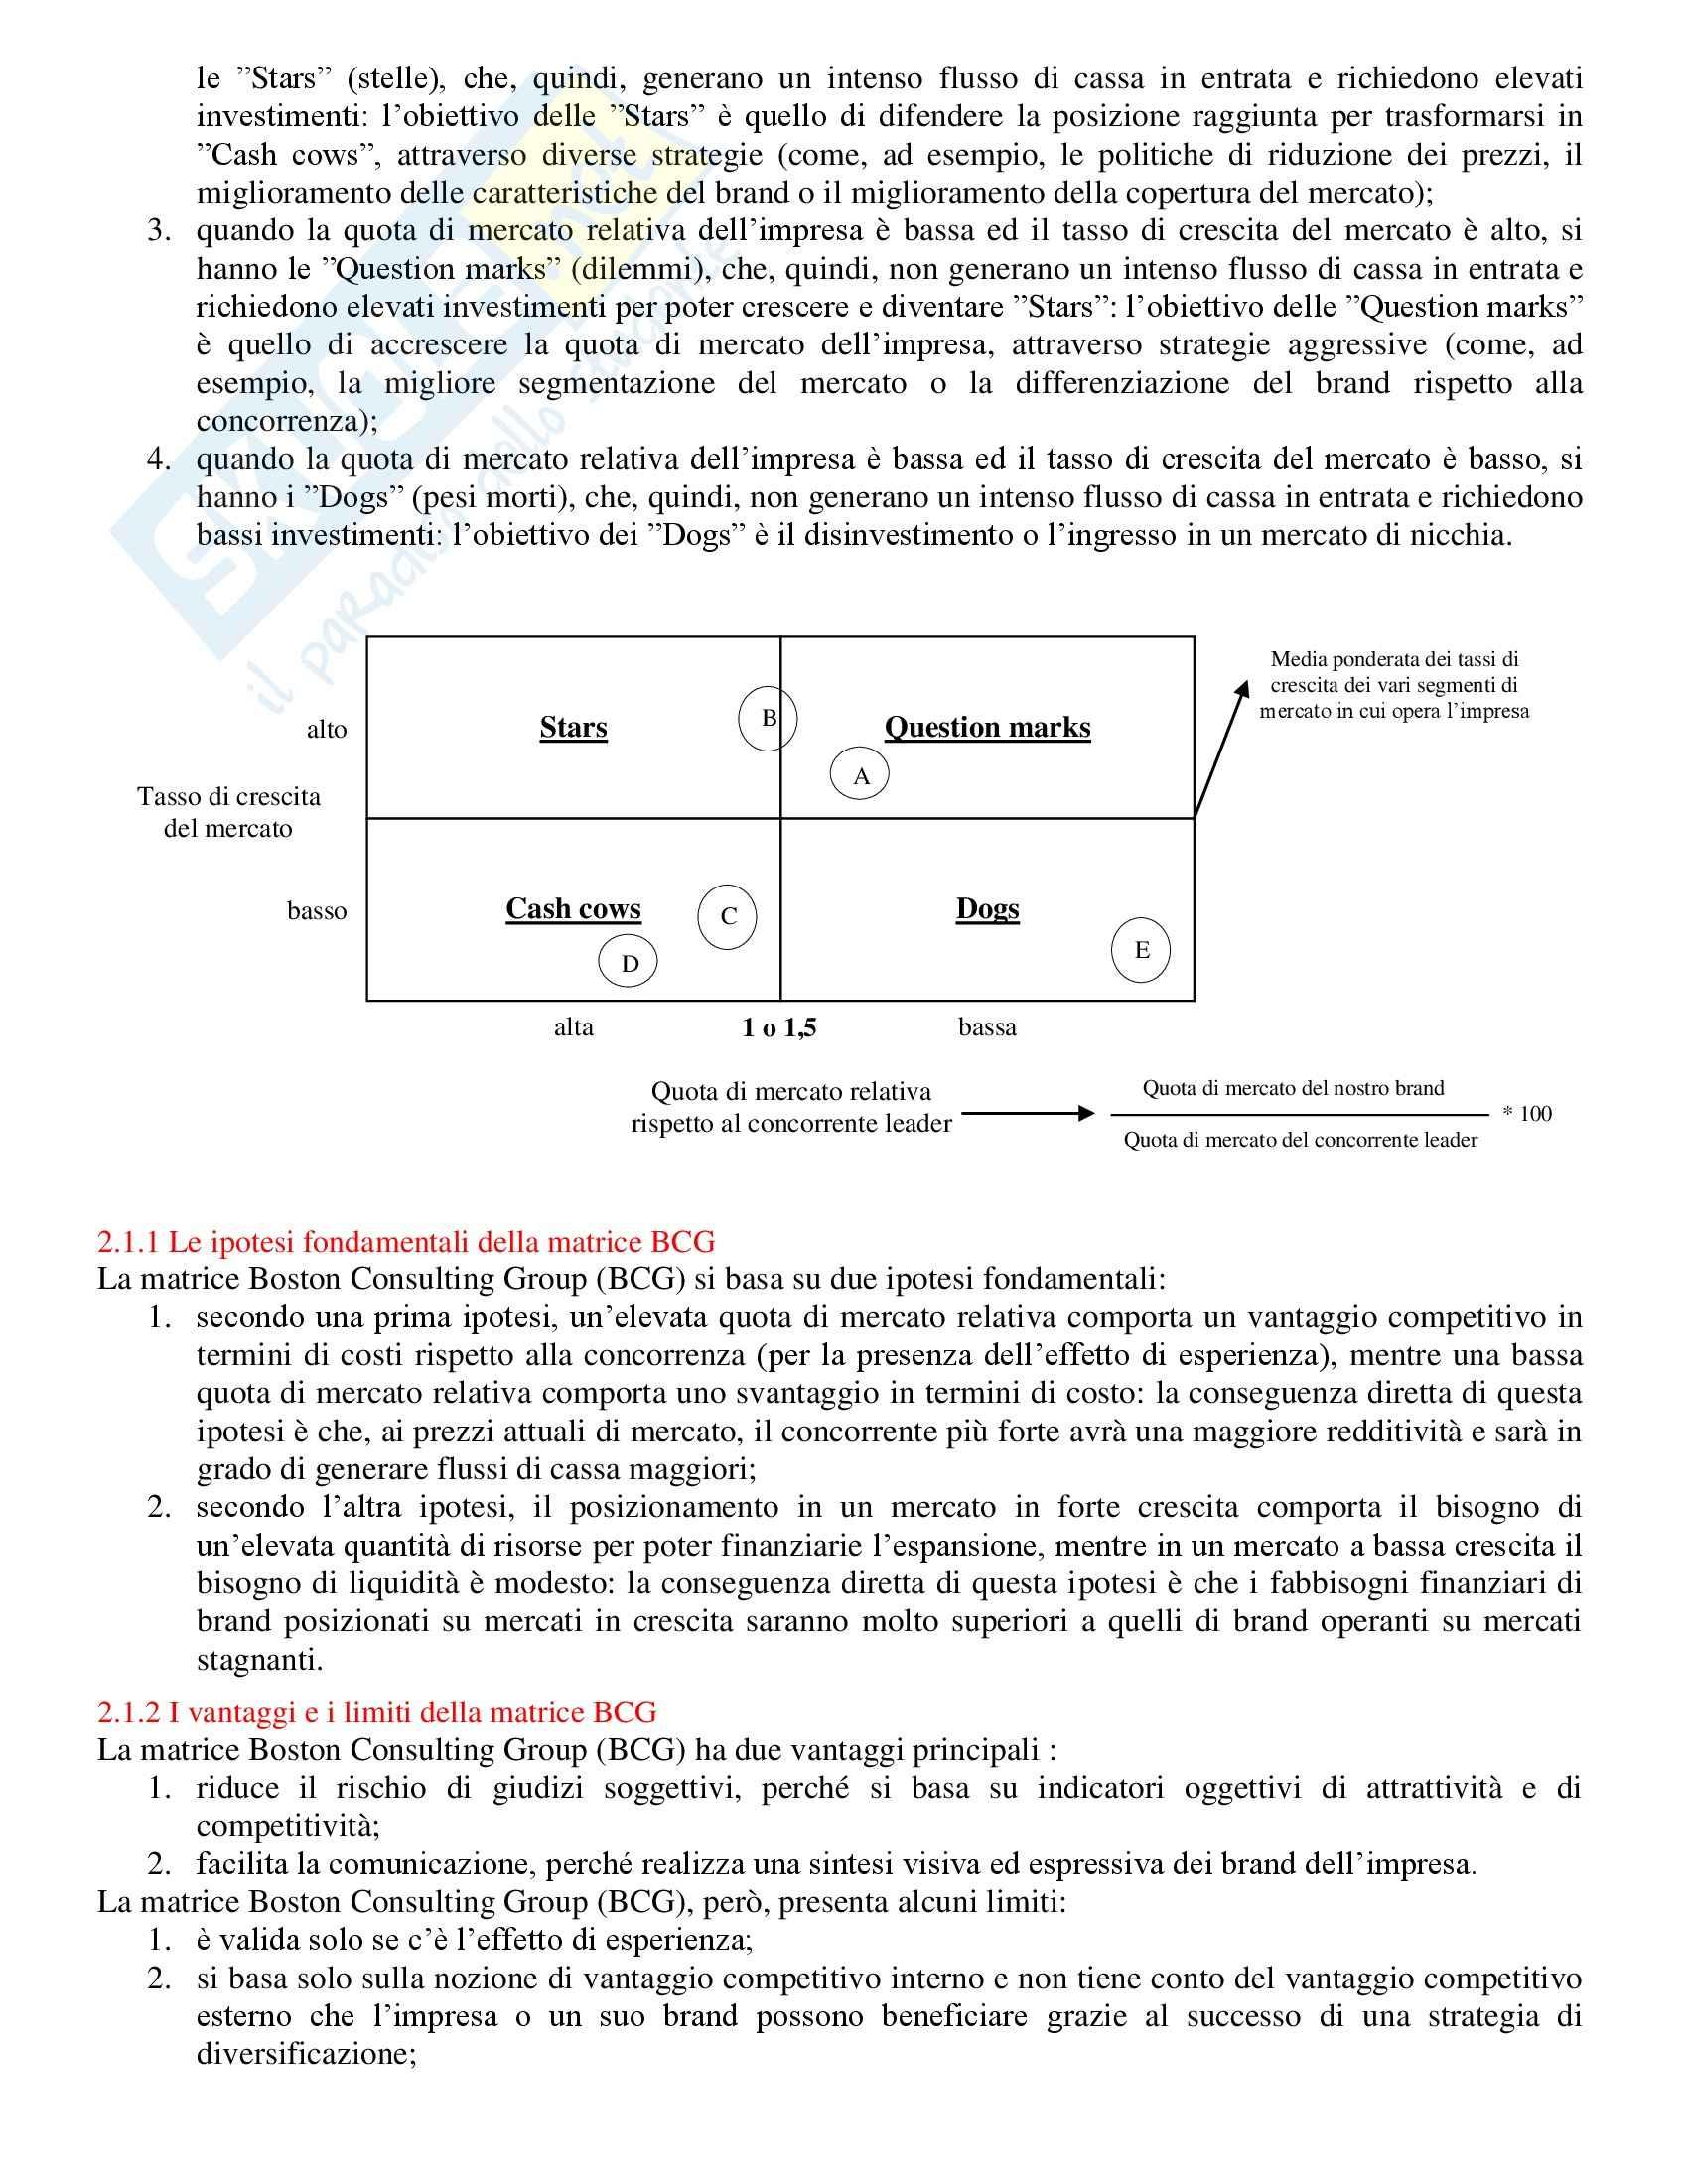 Strategie di marketing - Appunti Pag. 11